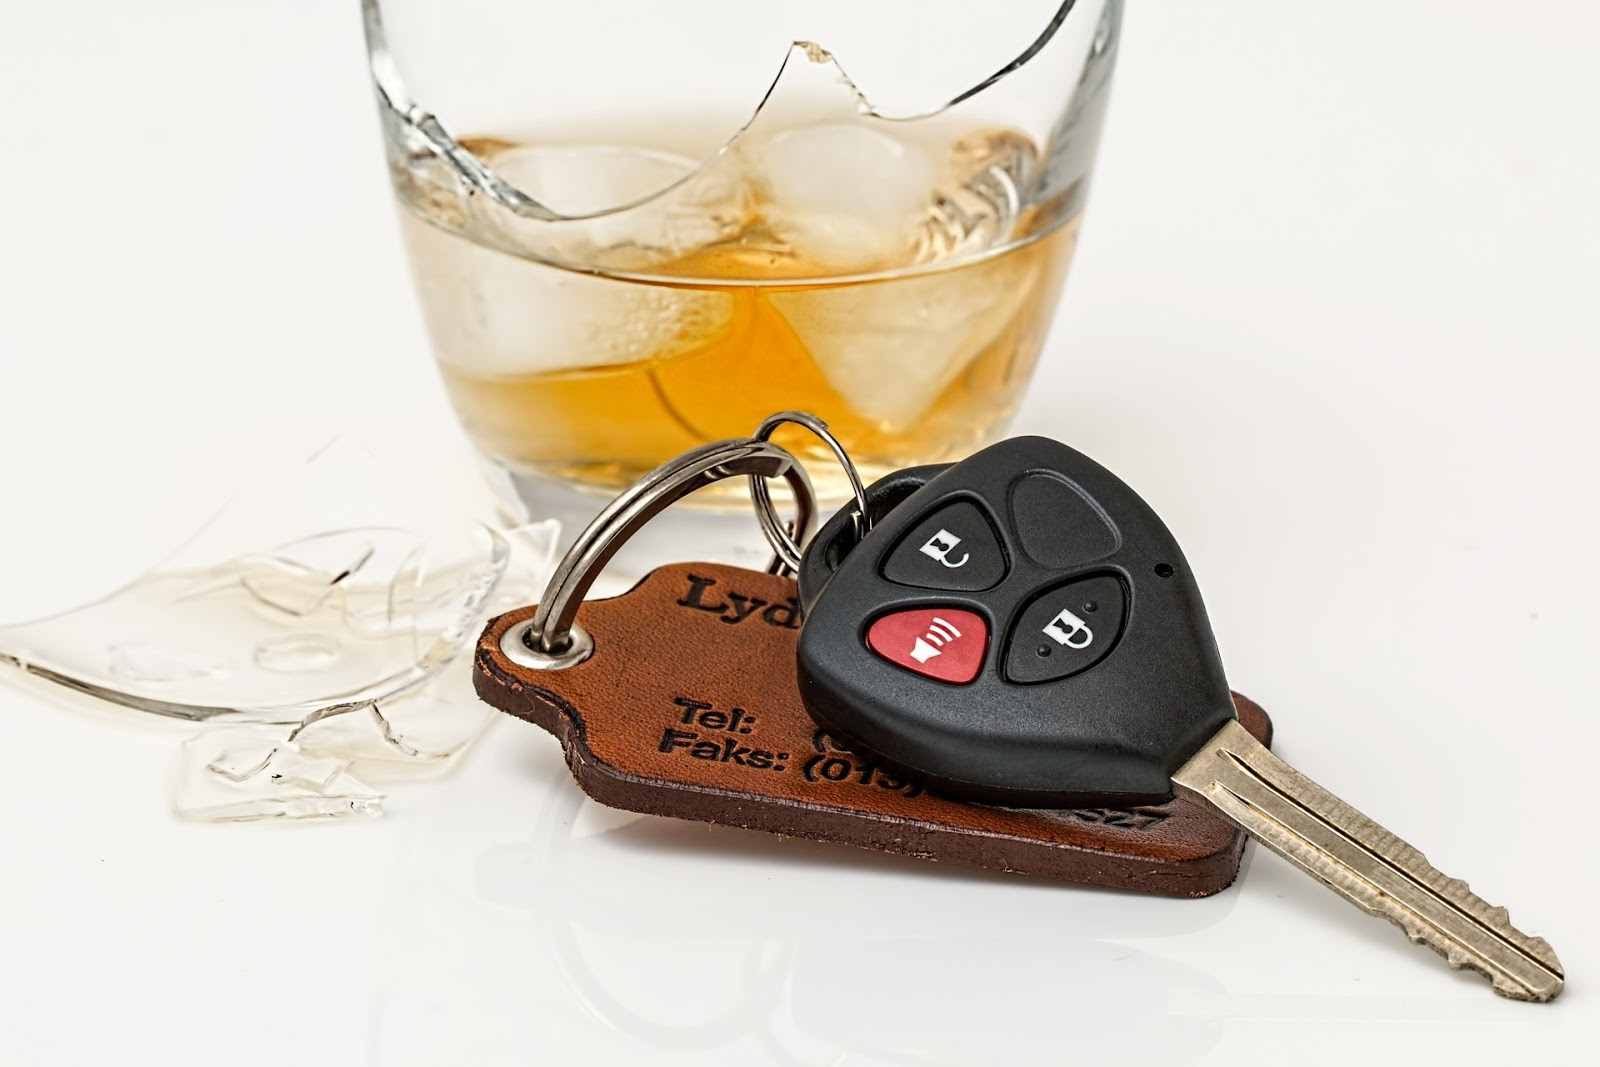 car key next to a drink